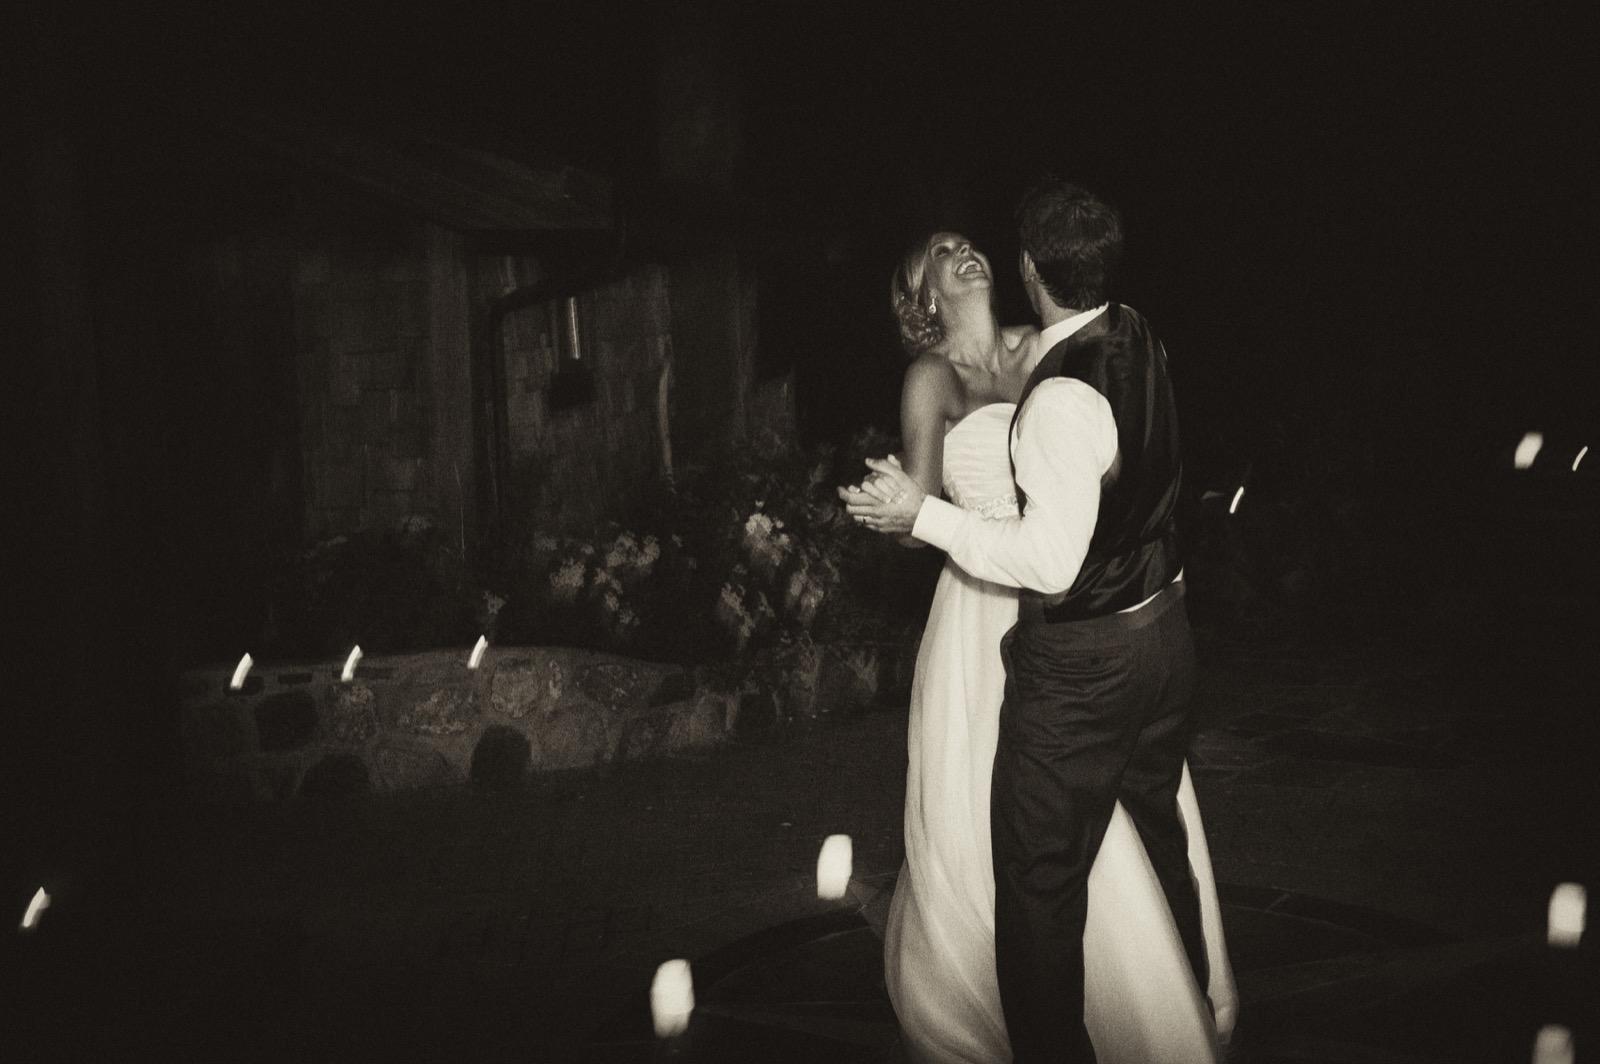 sooke-wedding-photographers-craidelonna-oceanedge-lodge-wedding-87.jpg